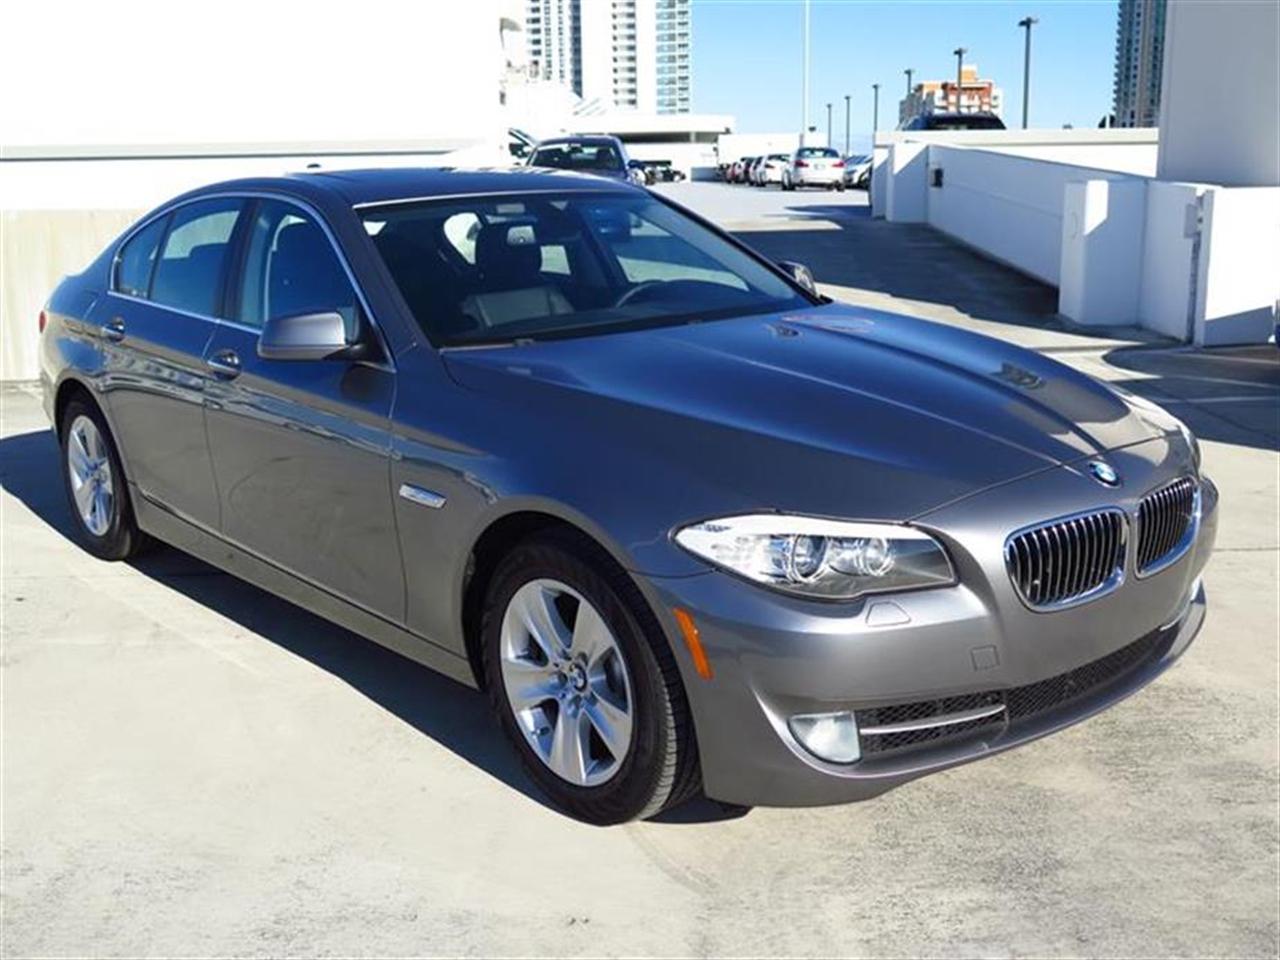 2012 BMW 5 SERIES 4dr Sdn 528i RWD 44953 miles 10-way power-adjustable front bucket seats -inc 4